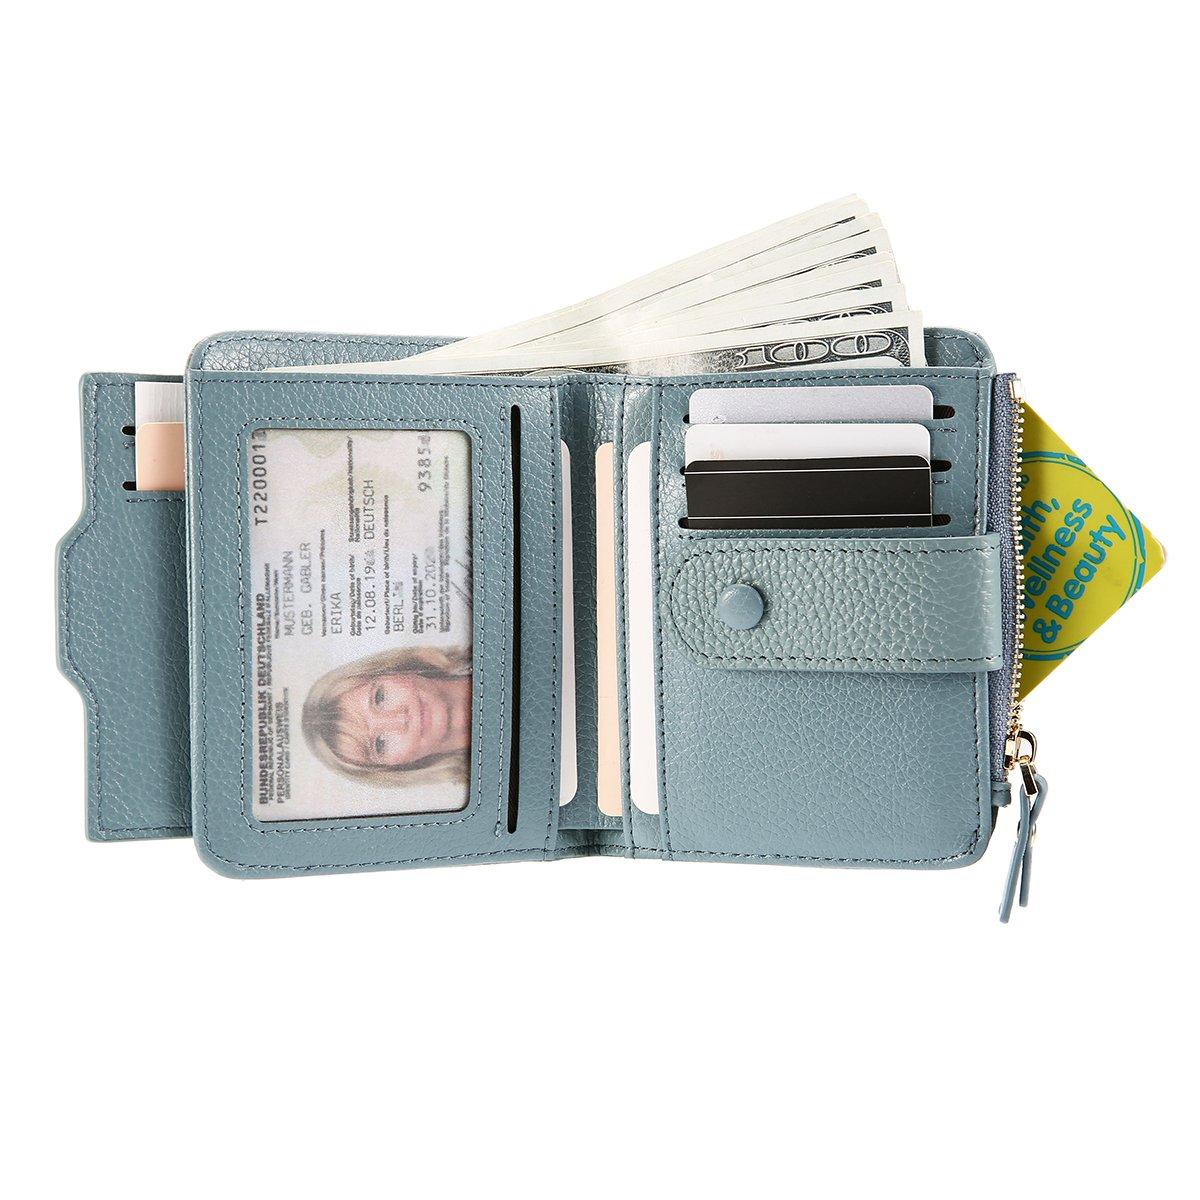 JOSEKO Leather Wallet Card Holder, Tassel Genuine Leather Multi-Slots Small Wallet Card Holder Purse for Women Light Blue 3.74''x0.79''x4.84'' (L x W x H)